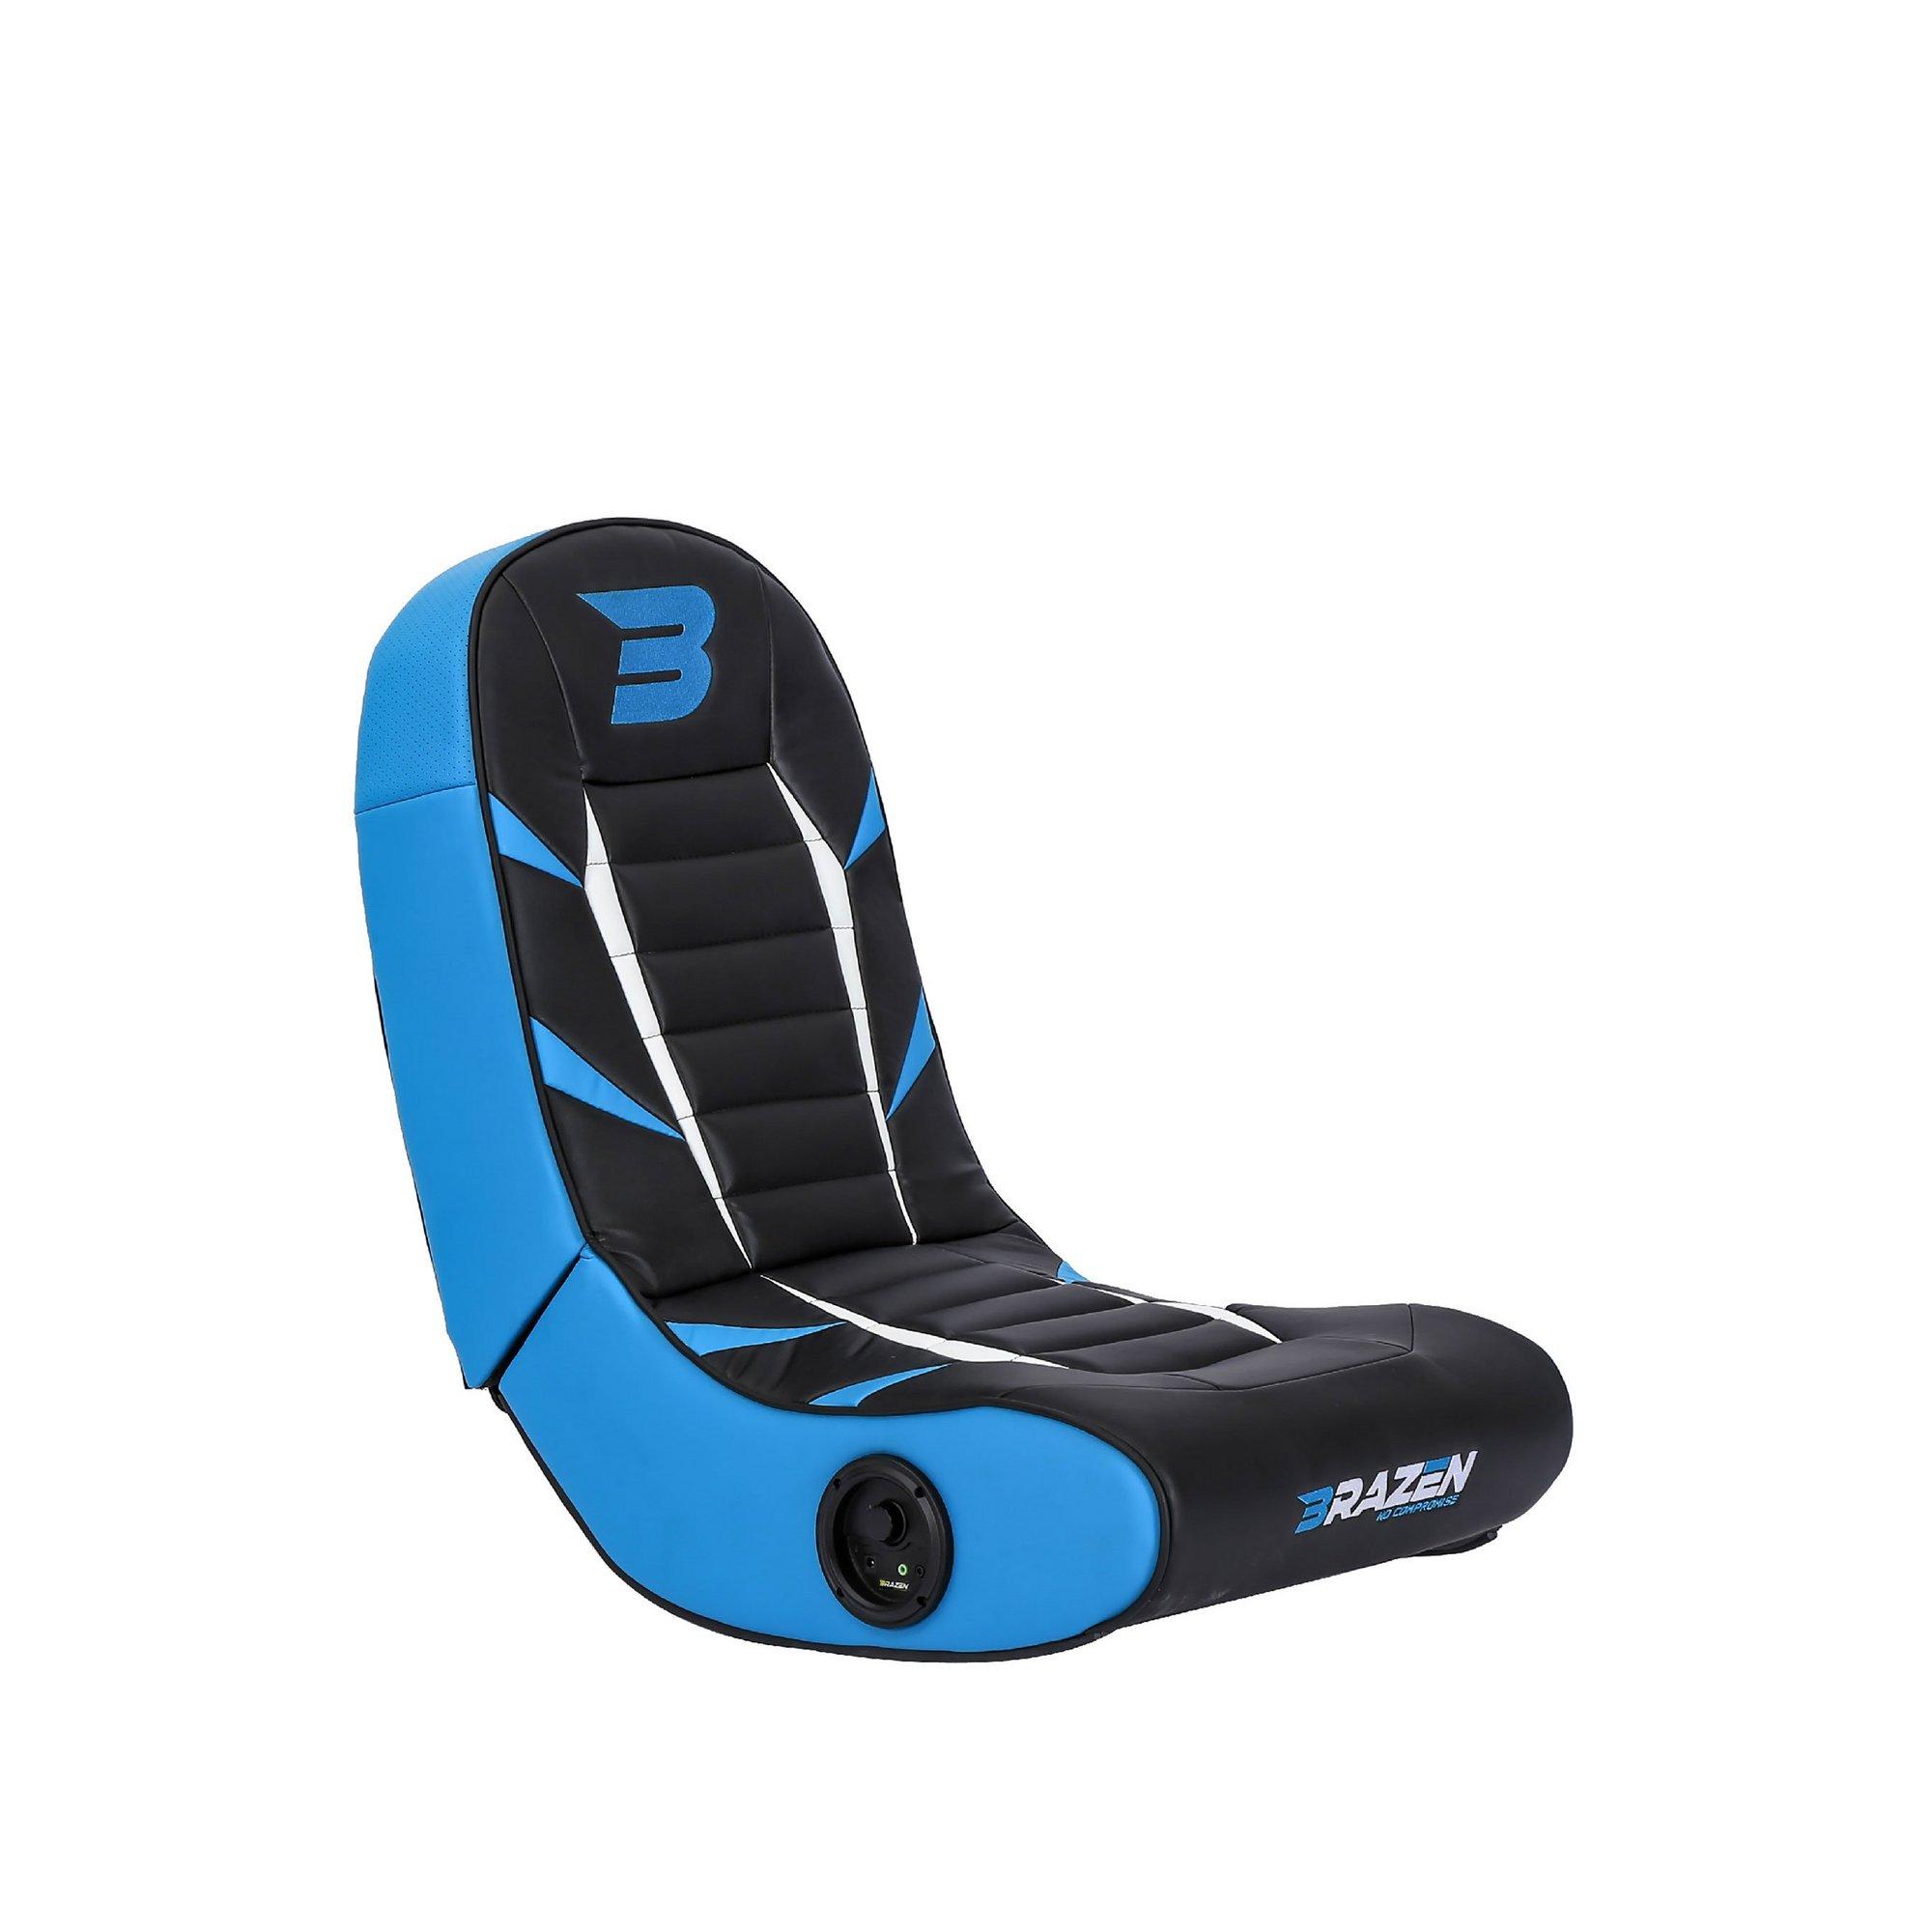 Image of BraZen Python 2.0 Bluetooth Gaming Chair